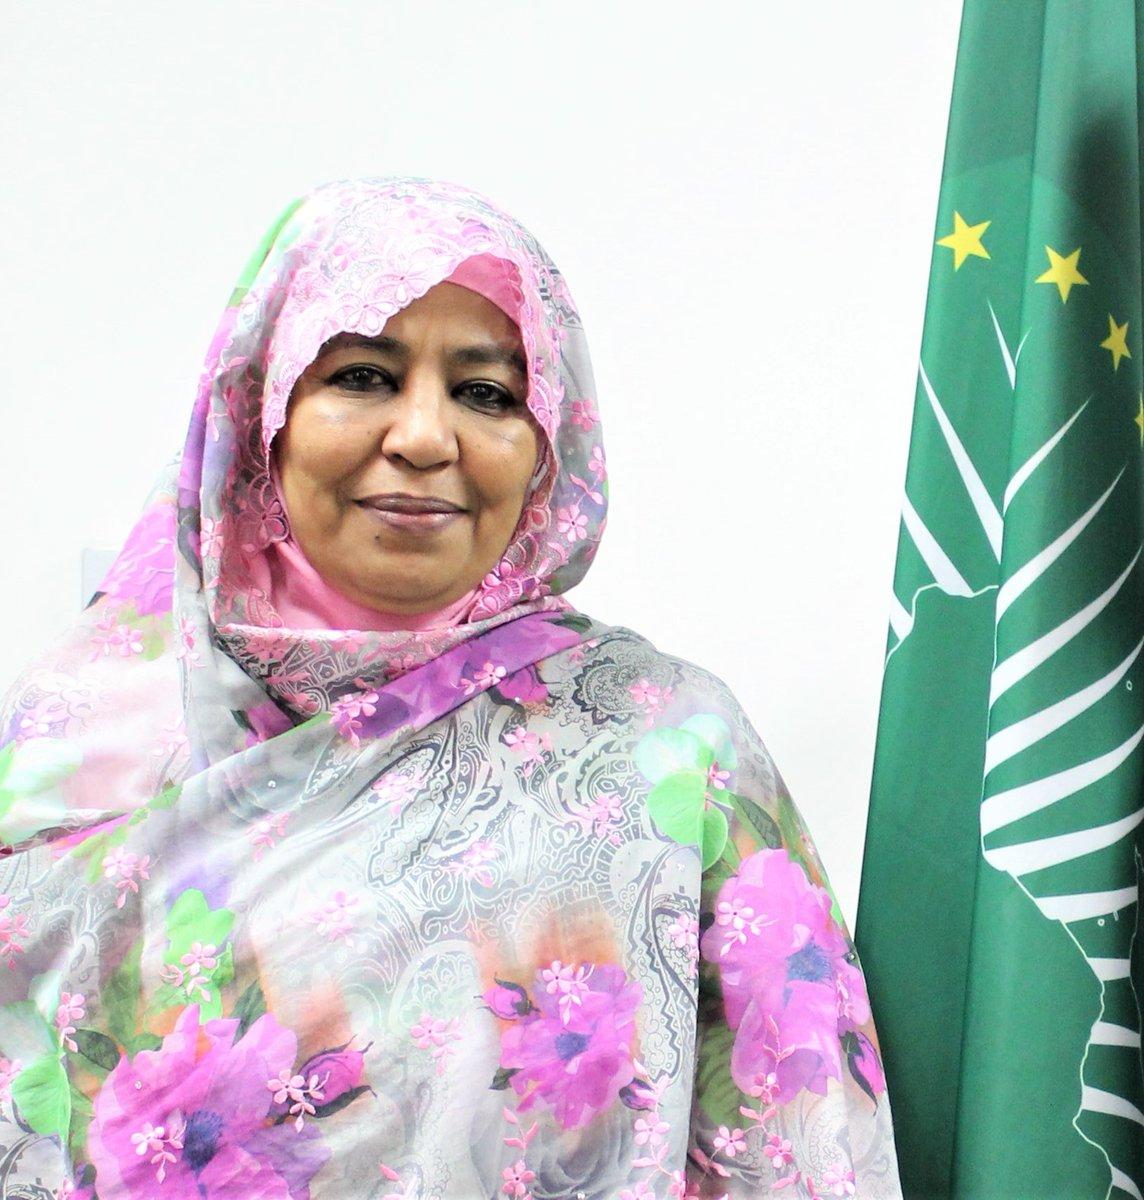 Commissioner Amira Elfadil Mohammed Elfadil